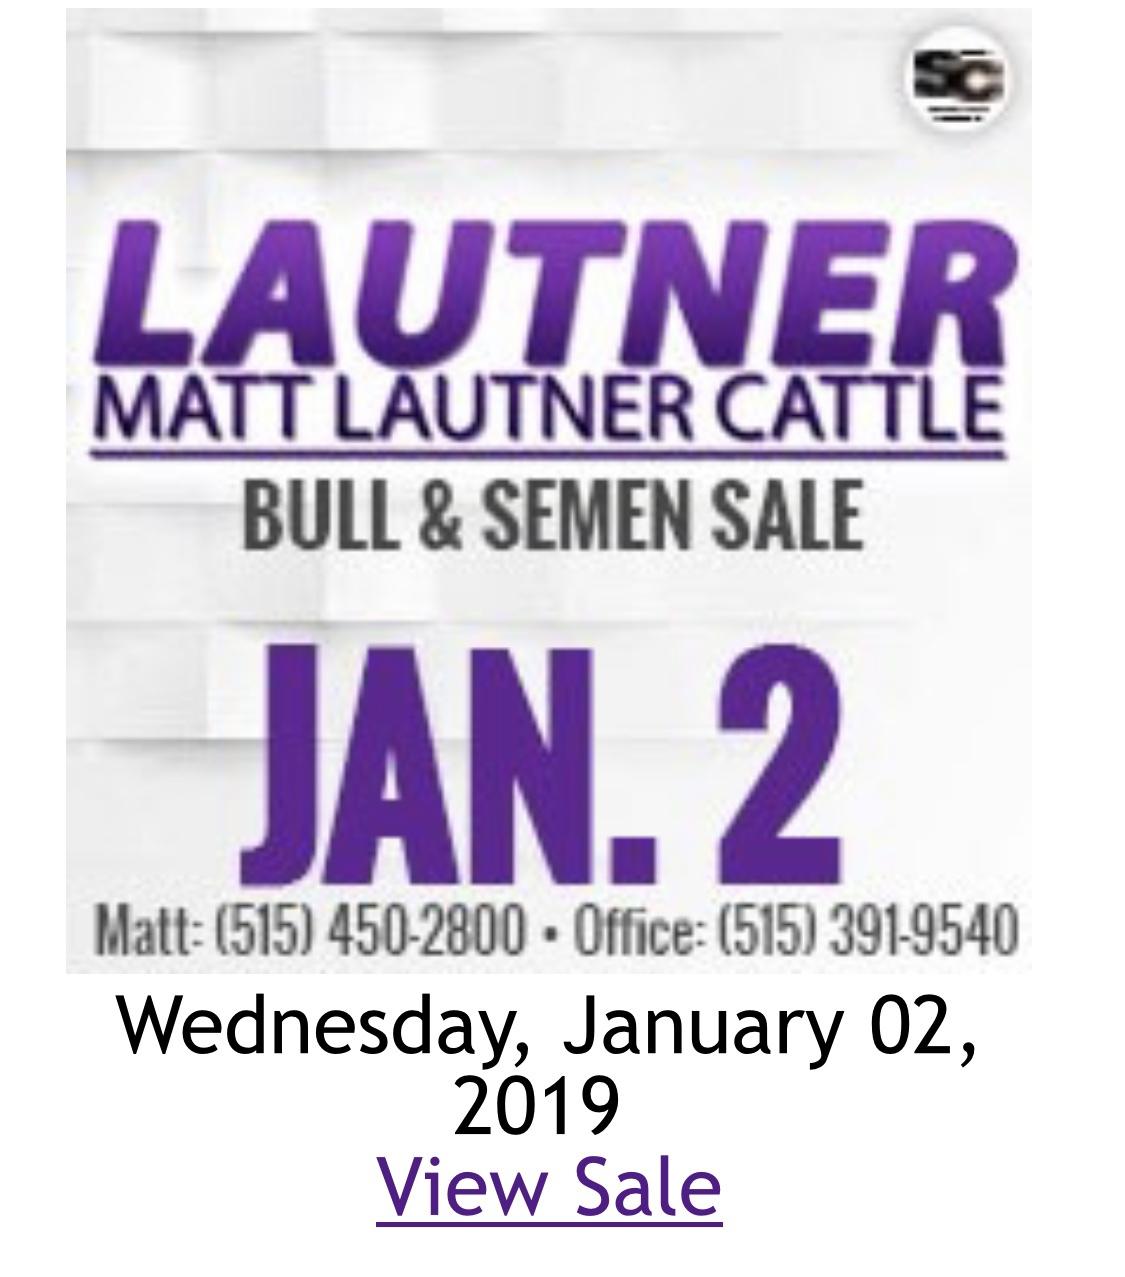 799692874a269 The Next Generation In Online Bull Buying!! – Matt Lautner Cattle ...